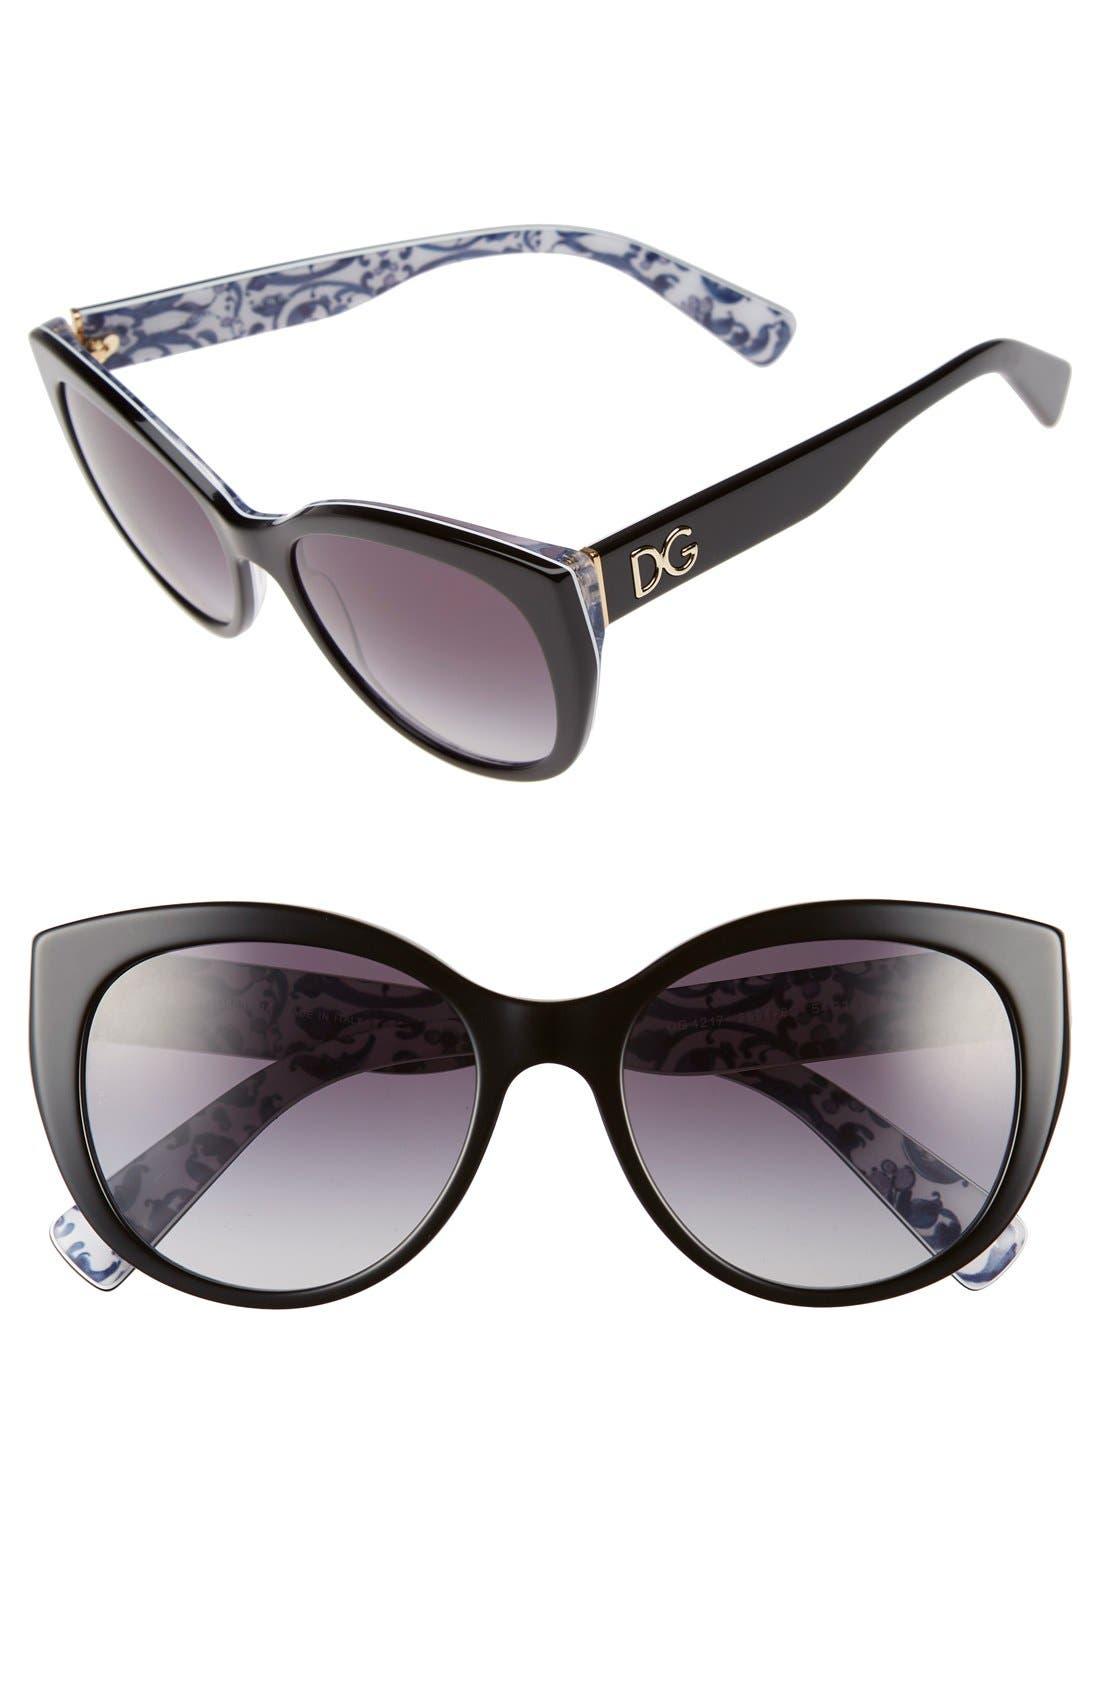 DOLCE&GABBANA 54mm Cat Eye Sunglasses